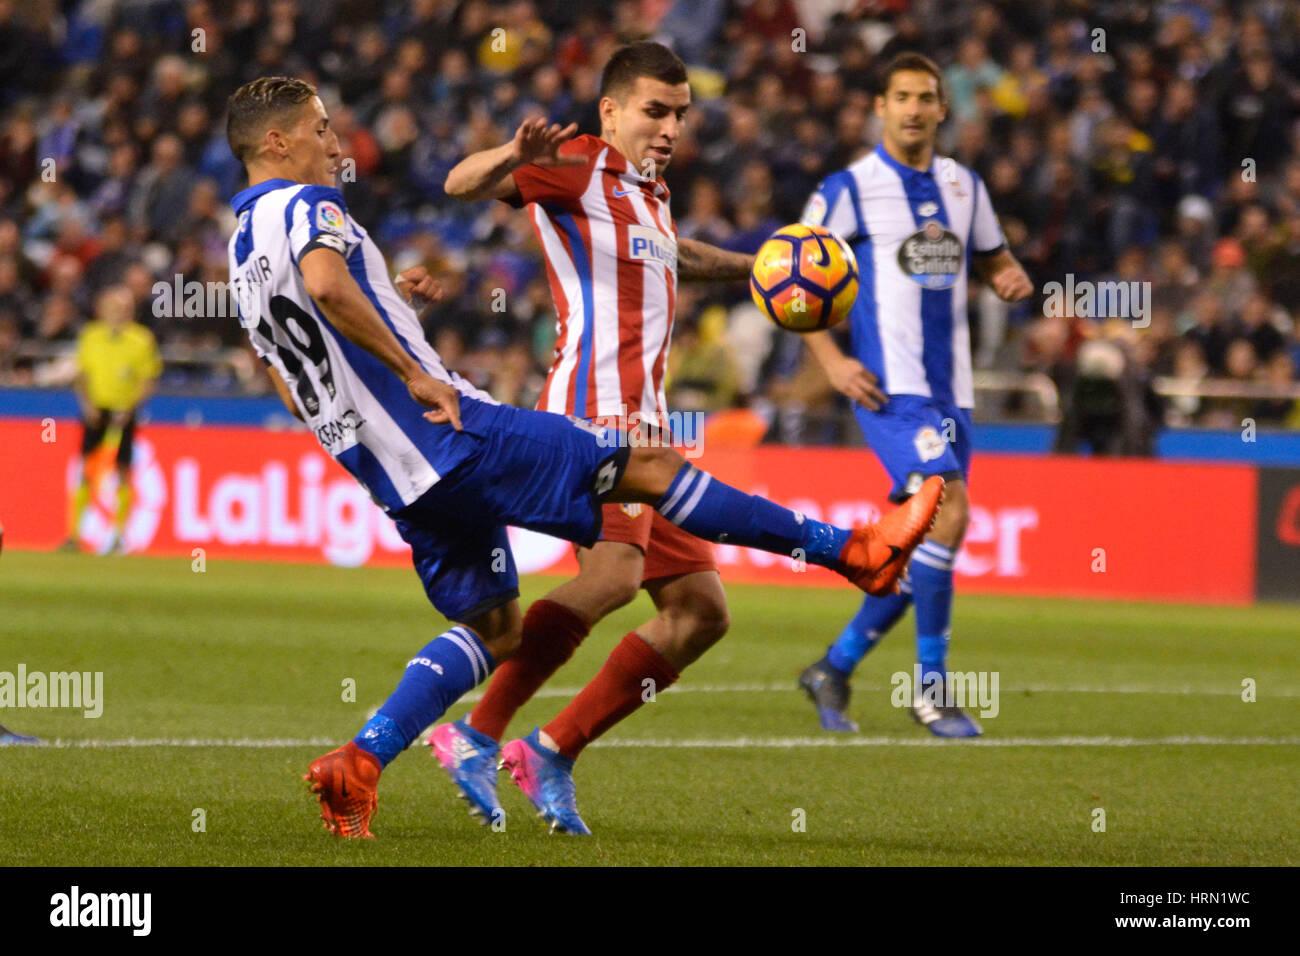 Riazor Stadium, La Coruna, Spain. 2nd March 2017. Fayçal. La Liga Santander Matchday 25. Riazor Stadium, La - Stock Image